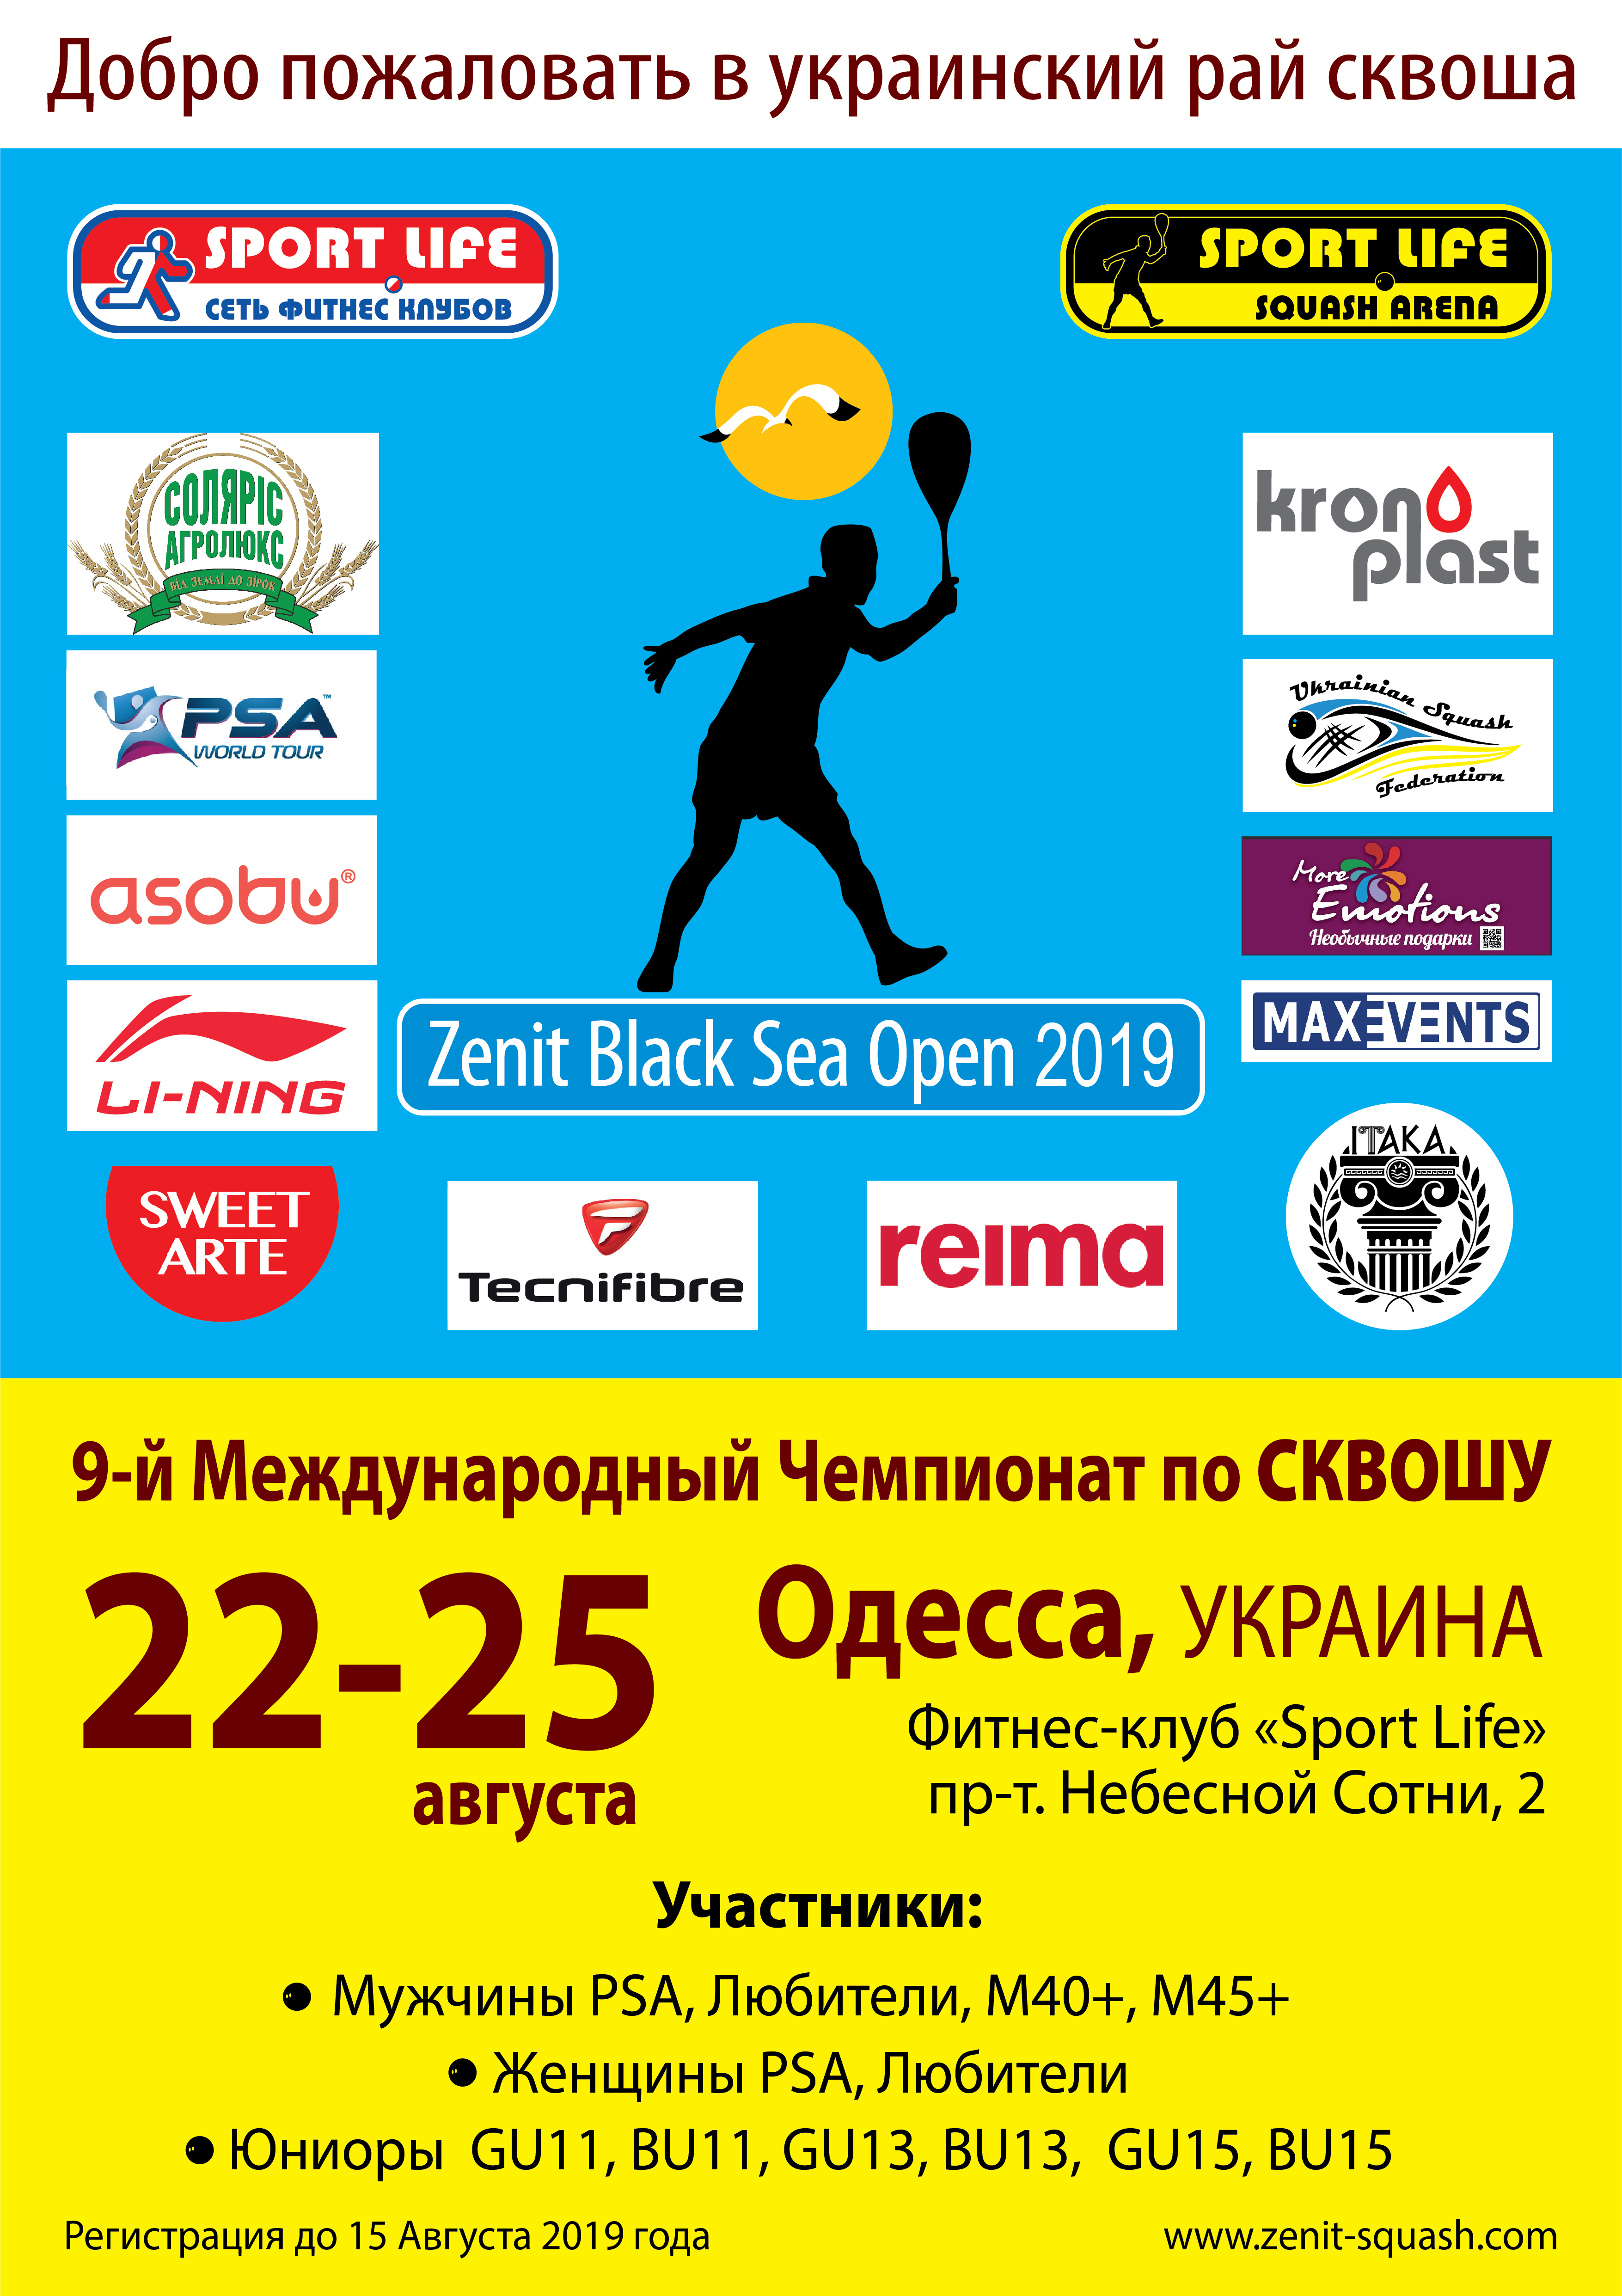 Zenit Black Sea Open 2019